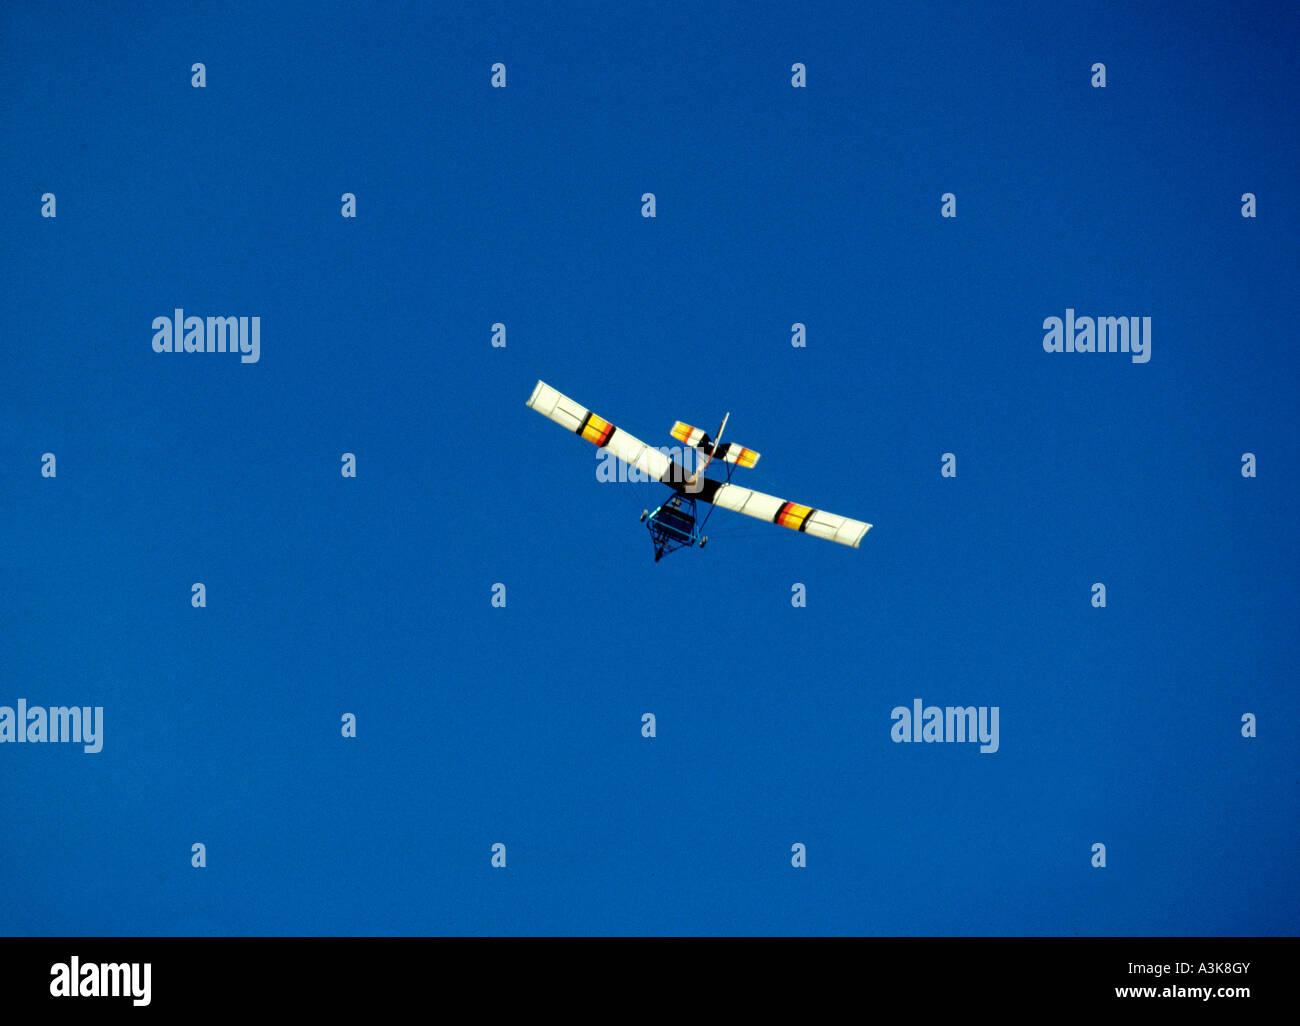 Microlite lightweight single engine aircraft against a blue sky - Stock Image